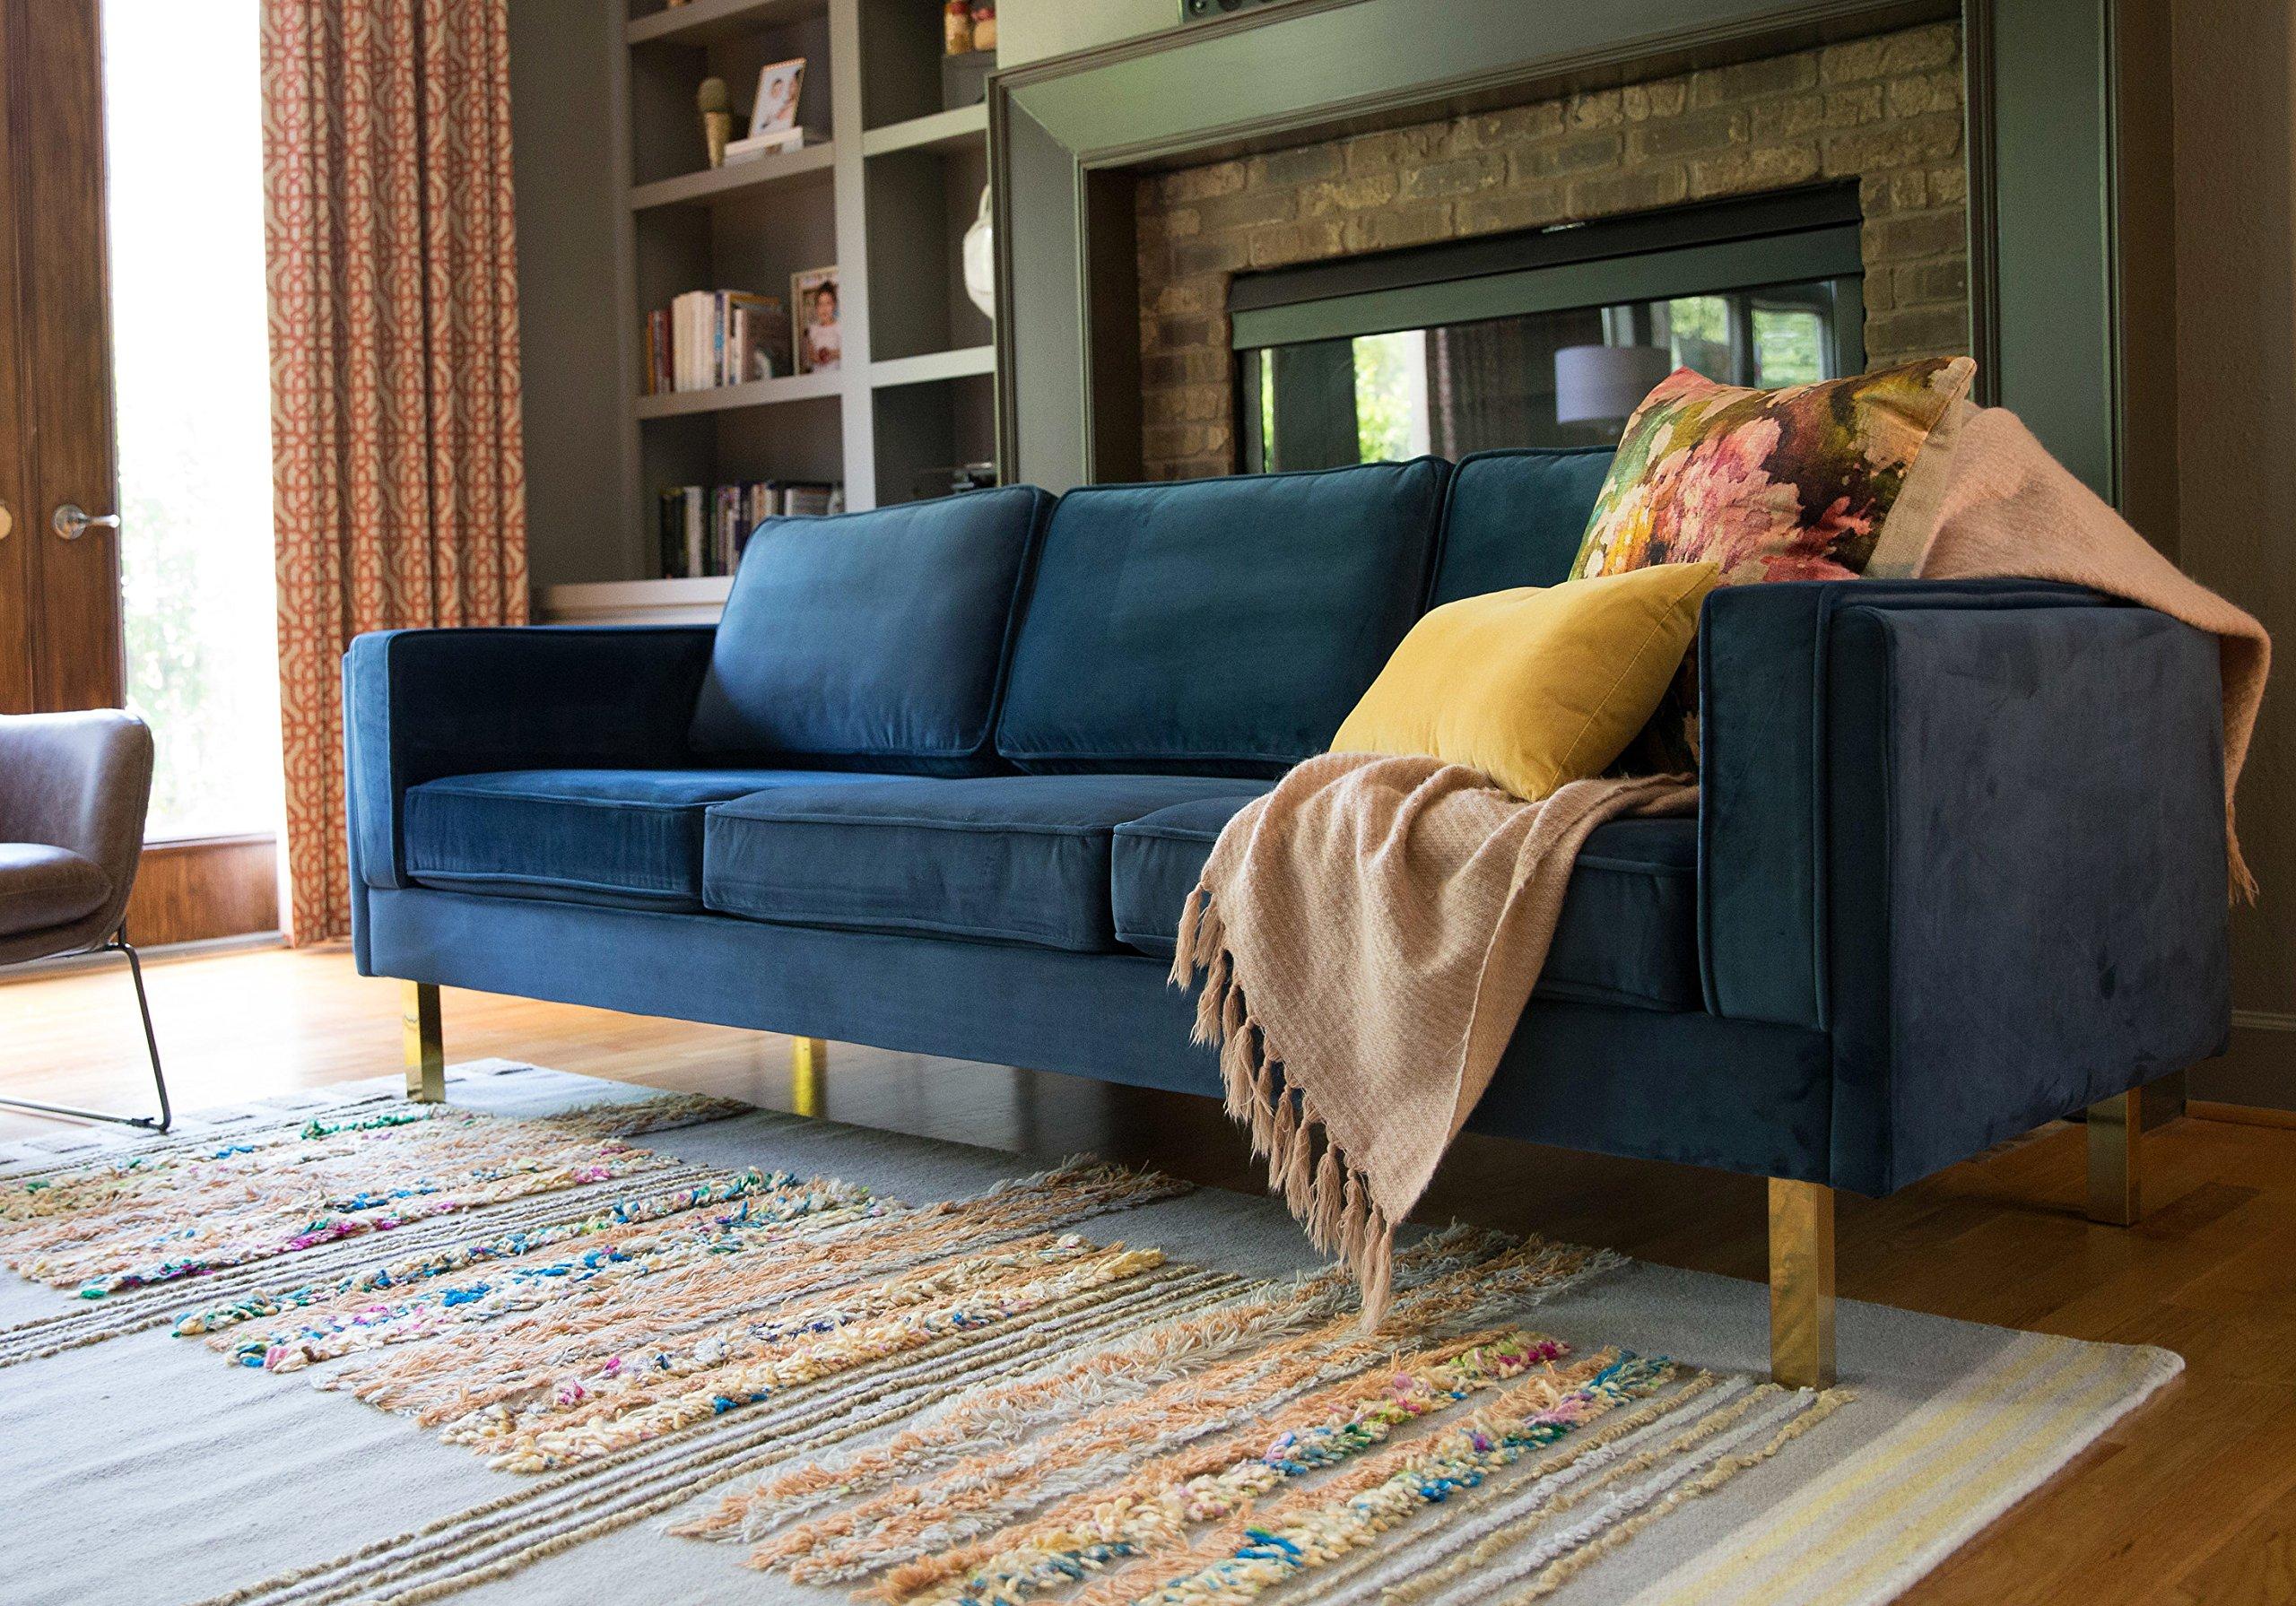 Admirable Edloe Finch Midcentury Modern Lexington Blue Velvet Sofa 87 Bralicious Painted Fabric Chair Ideas Braliciousco